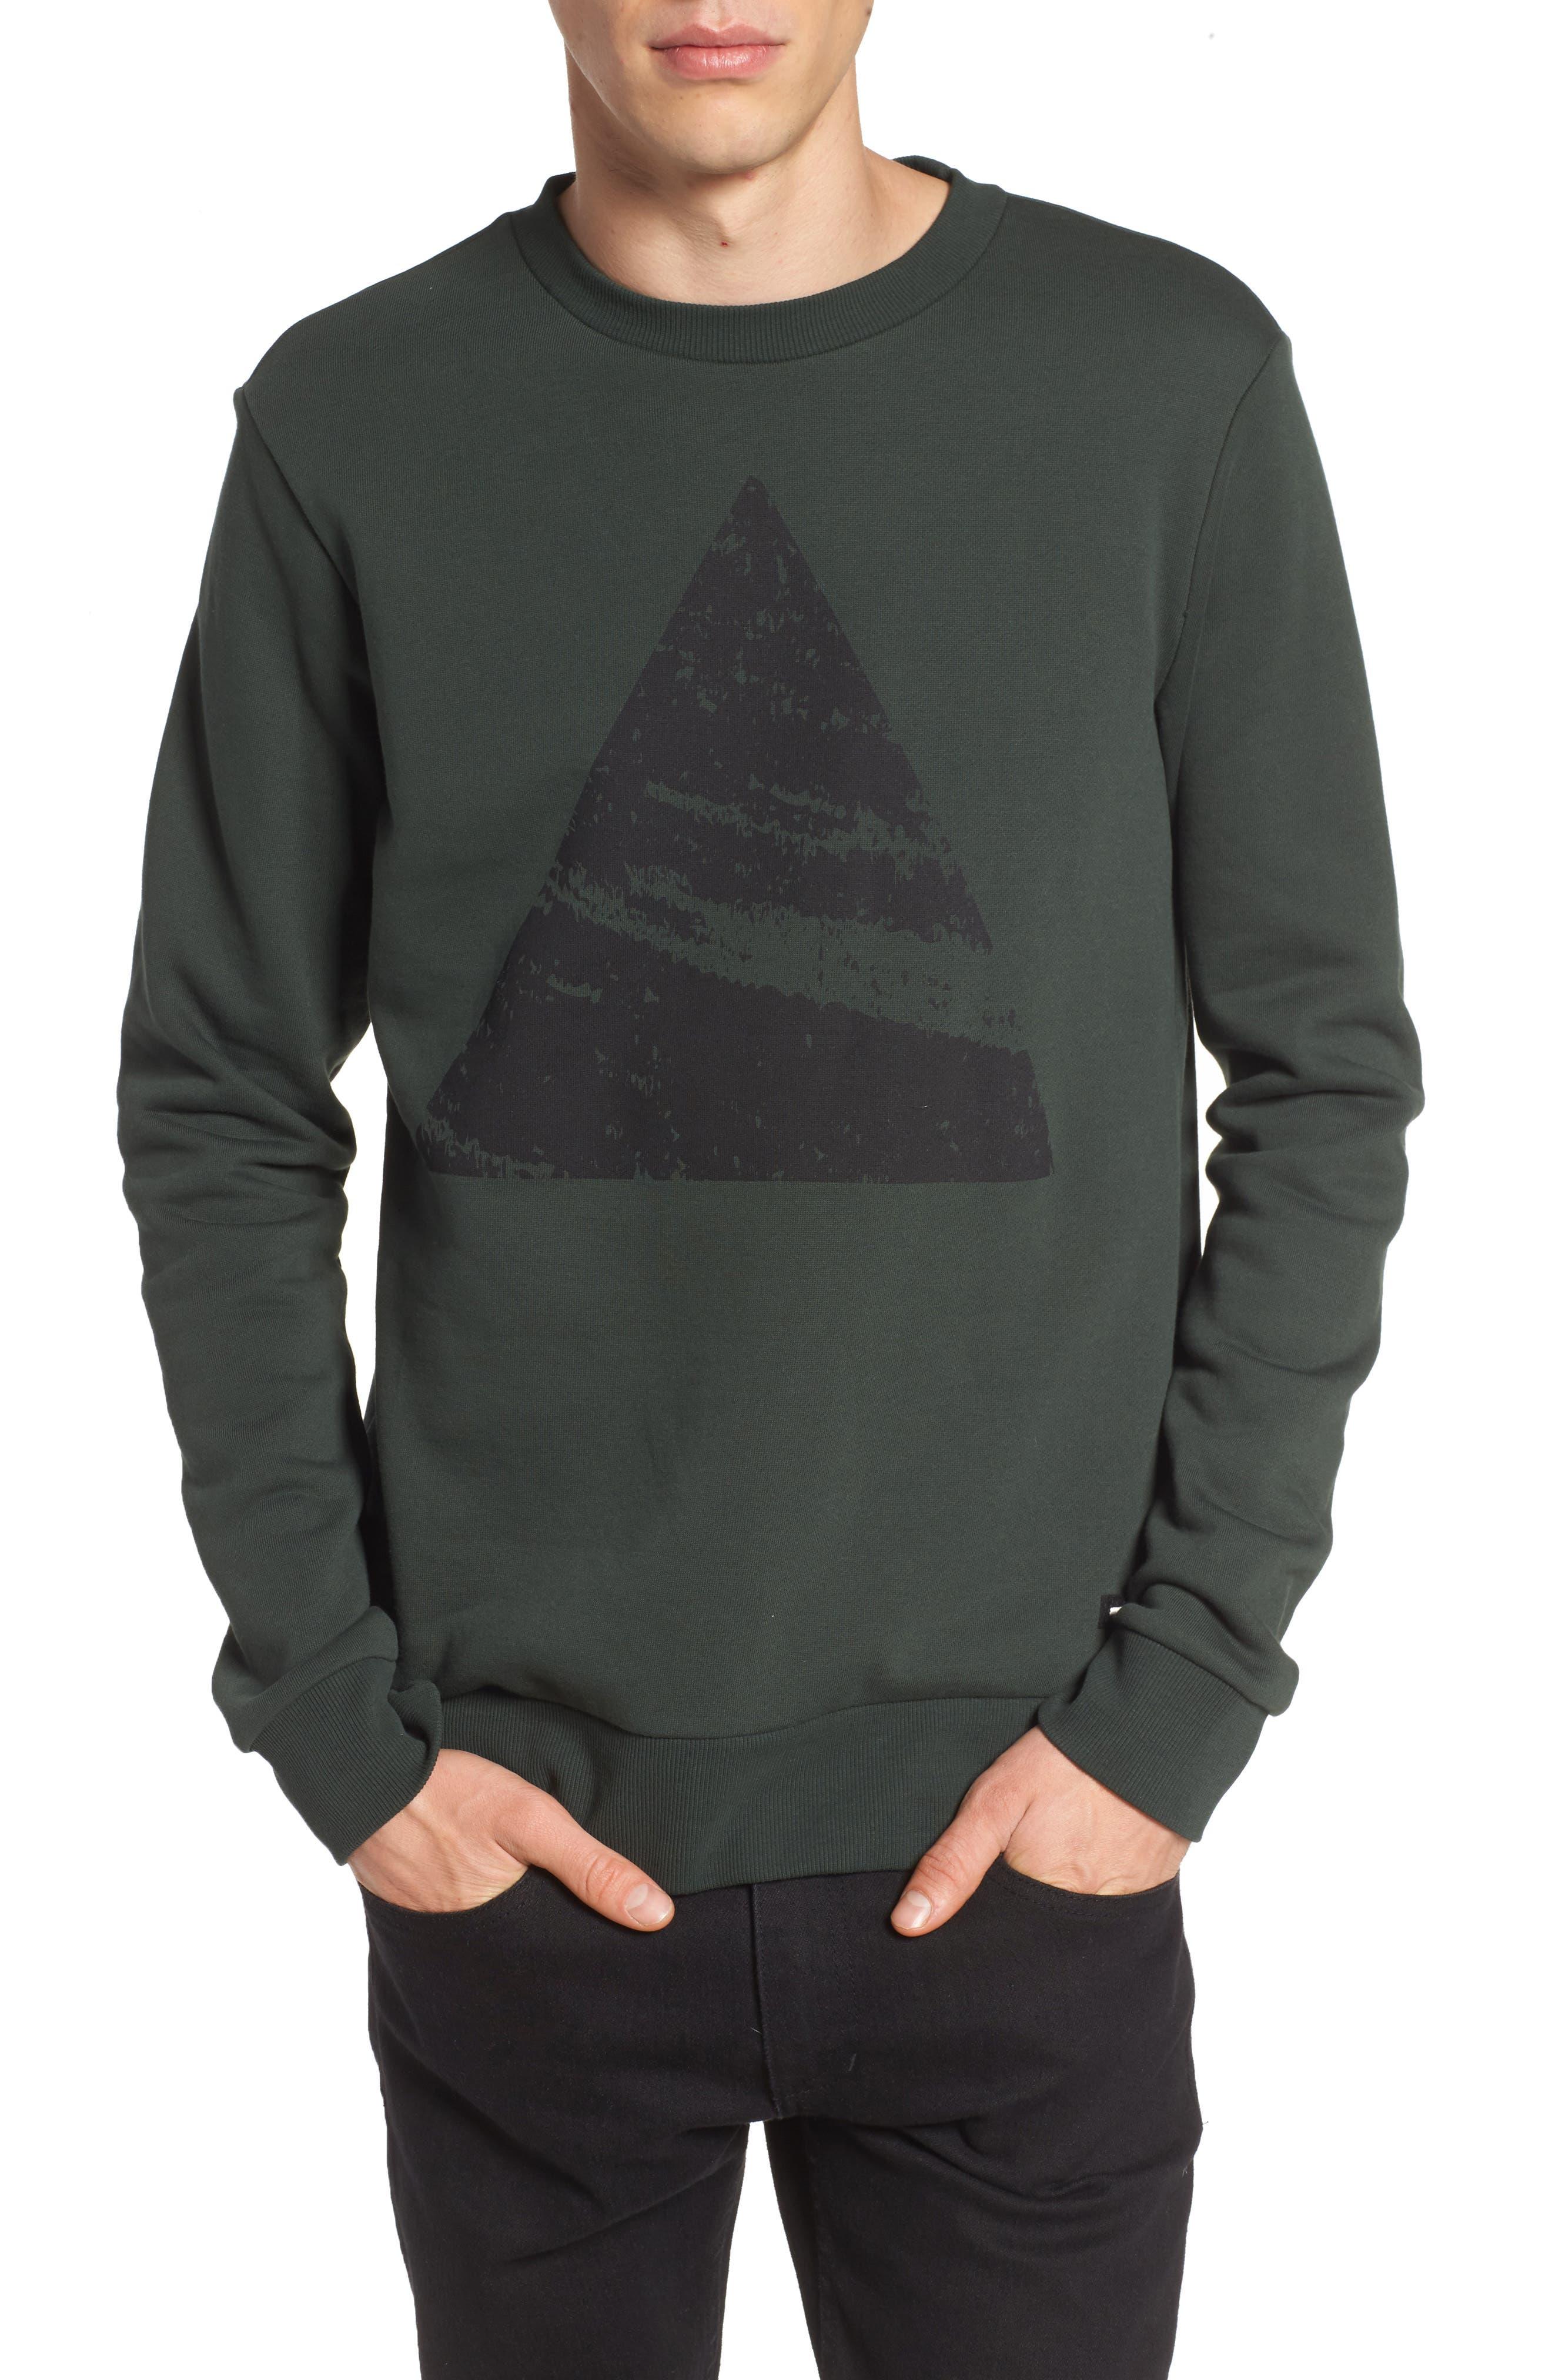 Adrian Sweatshirt,                             Main thumbnail 1, color,                             Green Mountain Peak